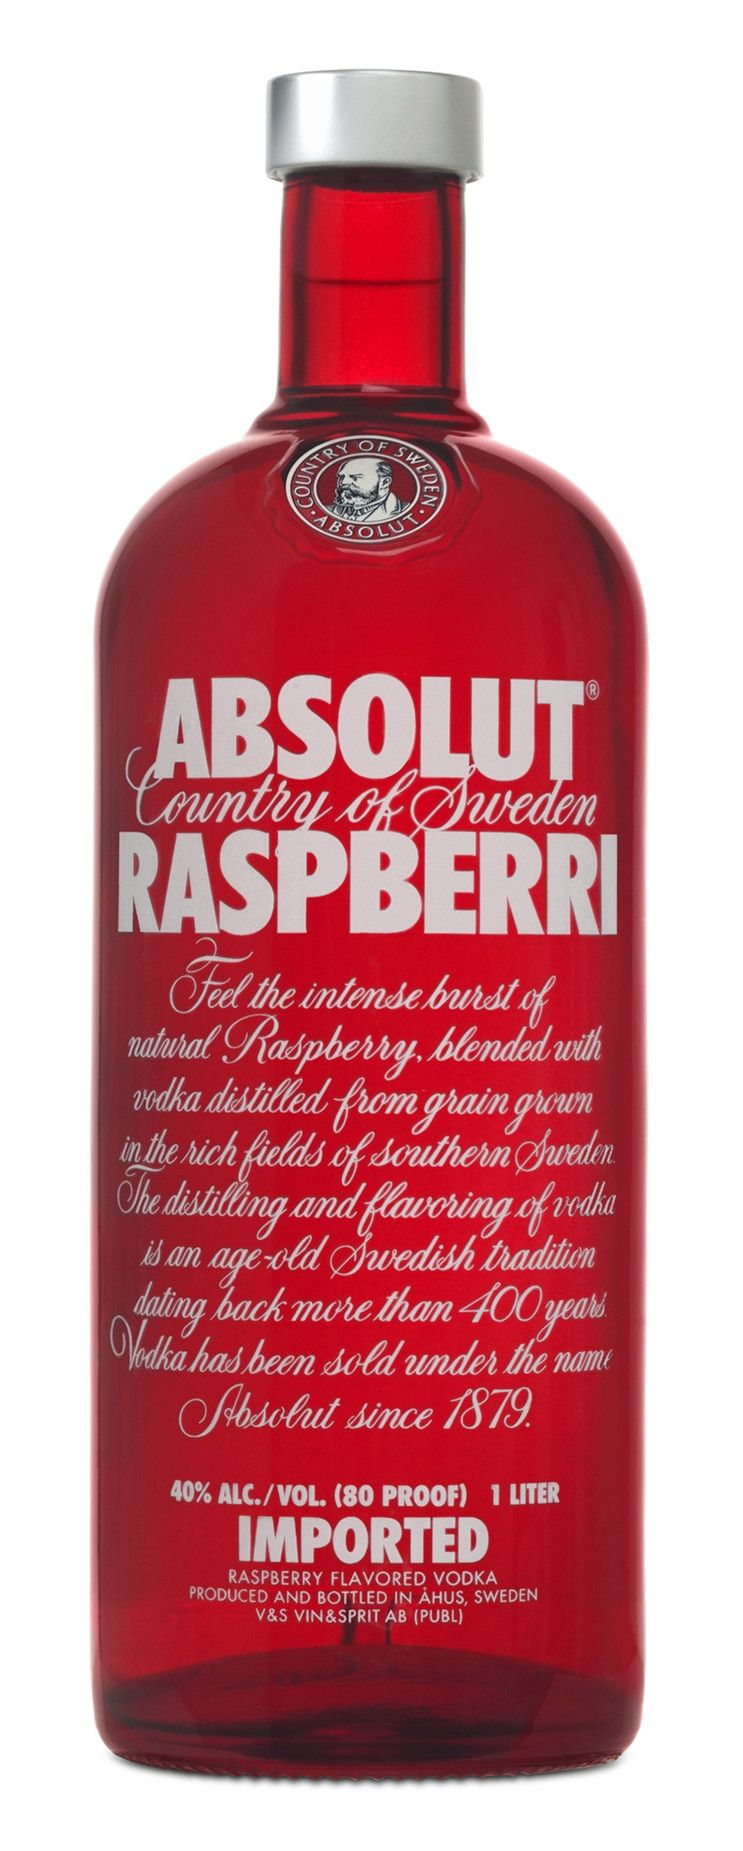 Absolut Raspberri Vodka Raspberry Vodka Absolut Vodka